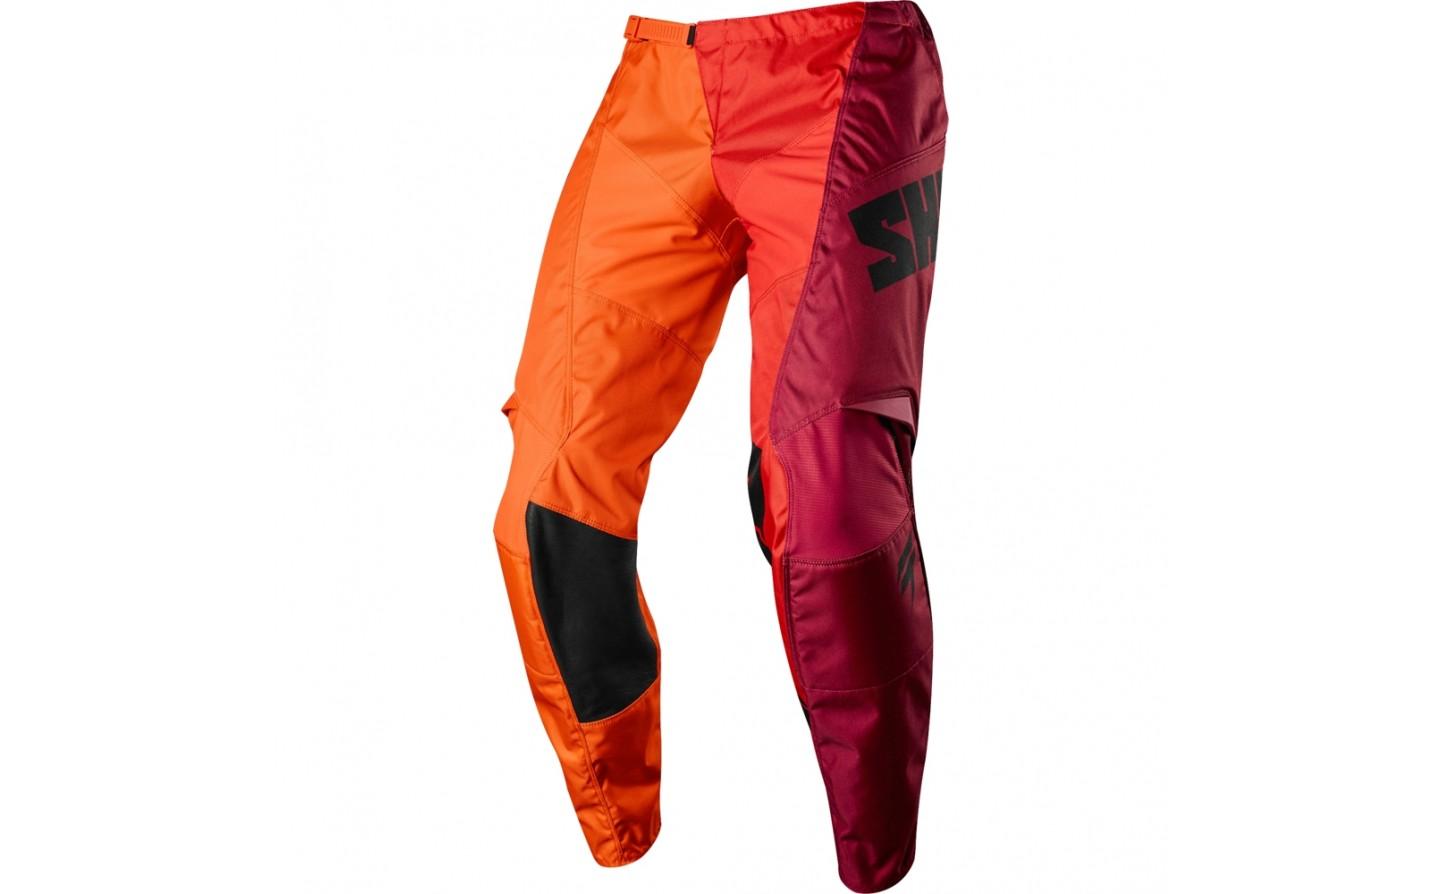 pantalon shift label whit3 tarmac naranja talle 32